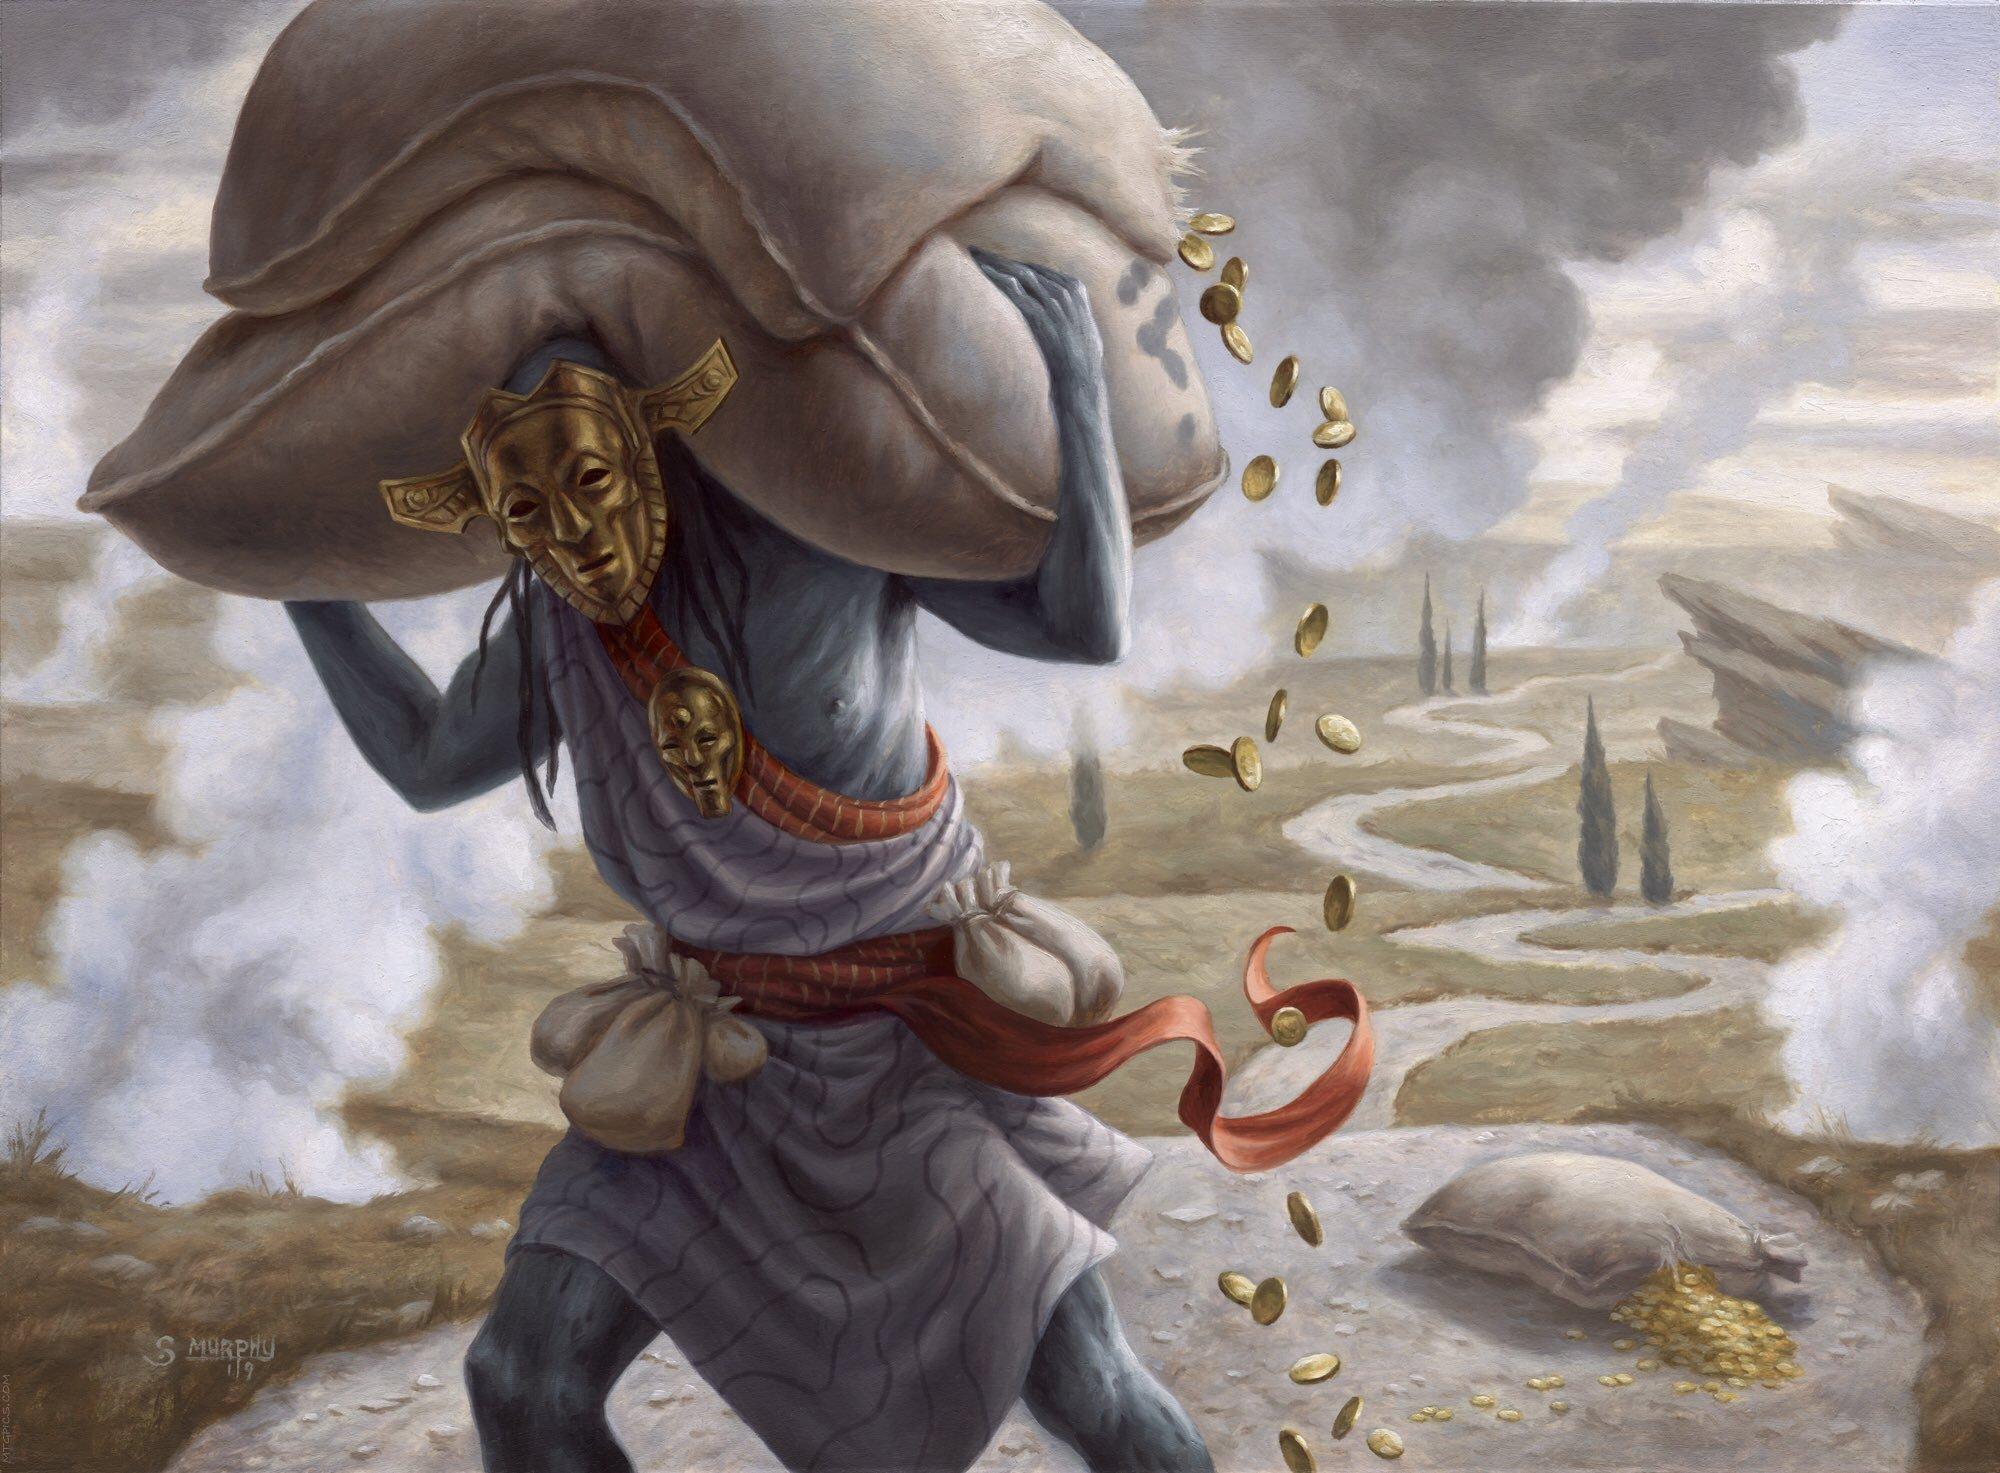 Gray Merchant of Asphodel | Illustrated by Scott Murphy